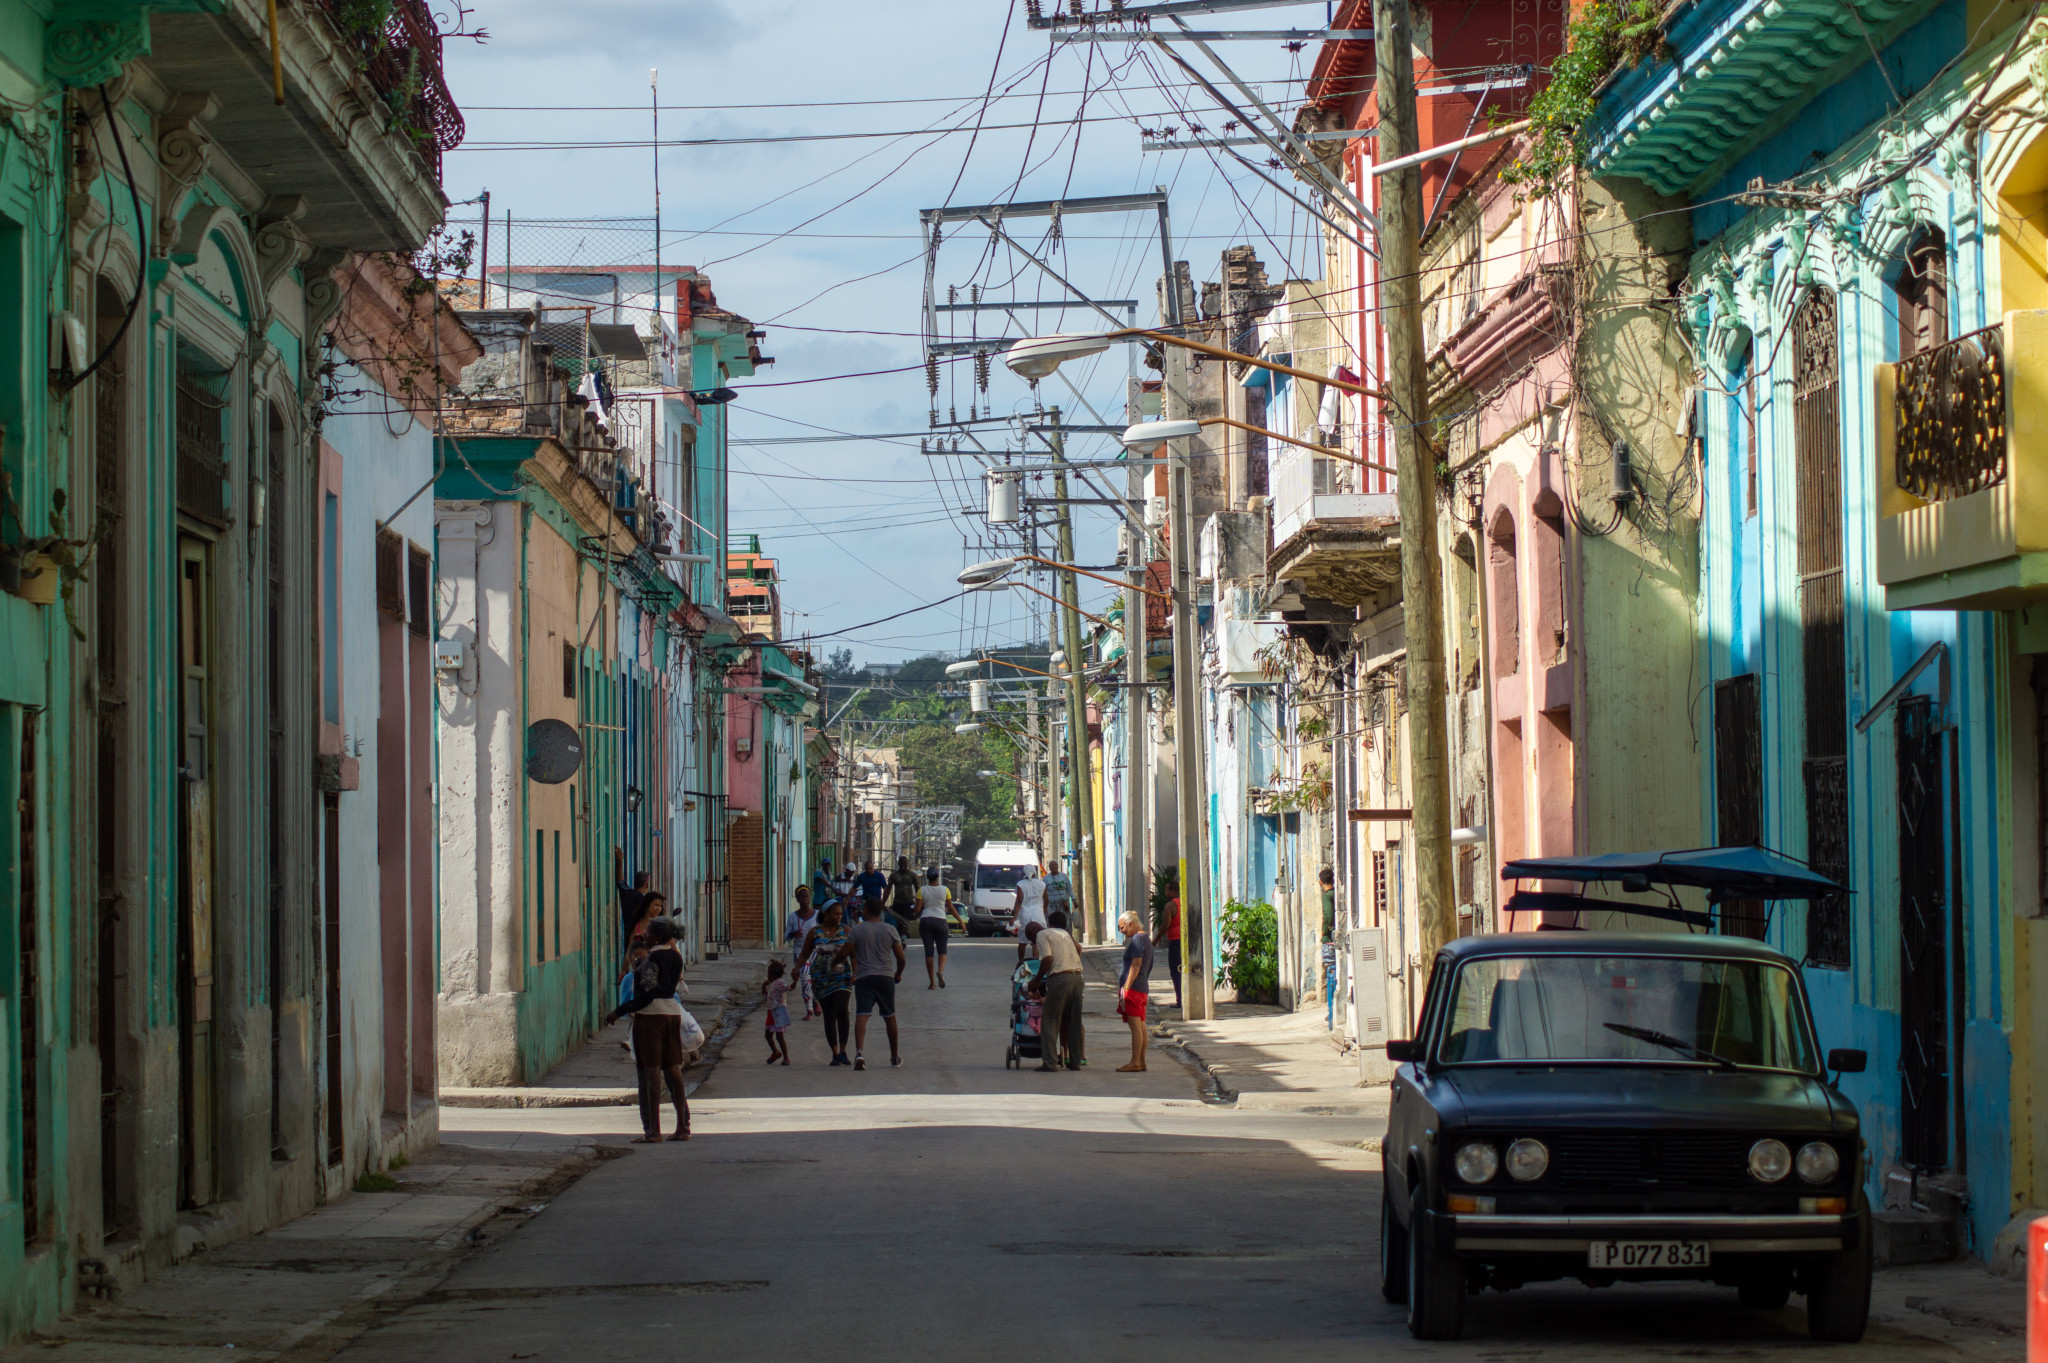 Strassenszene in Havanna